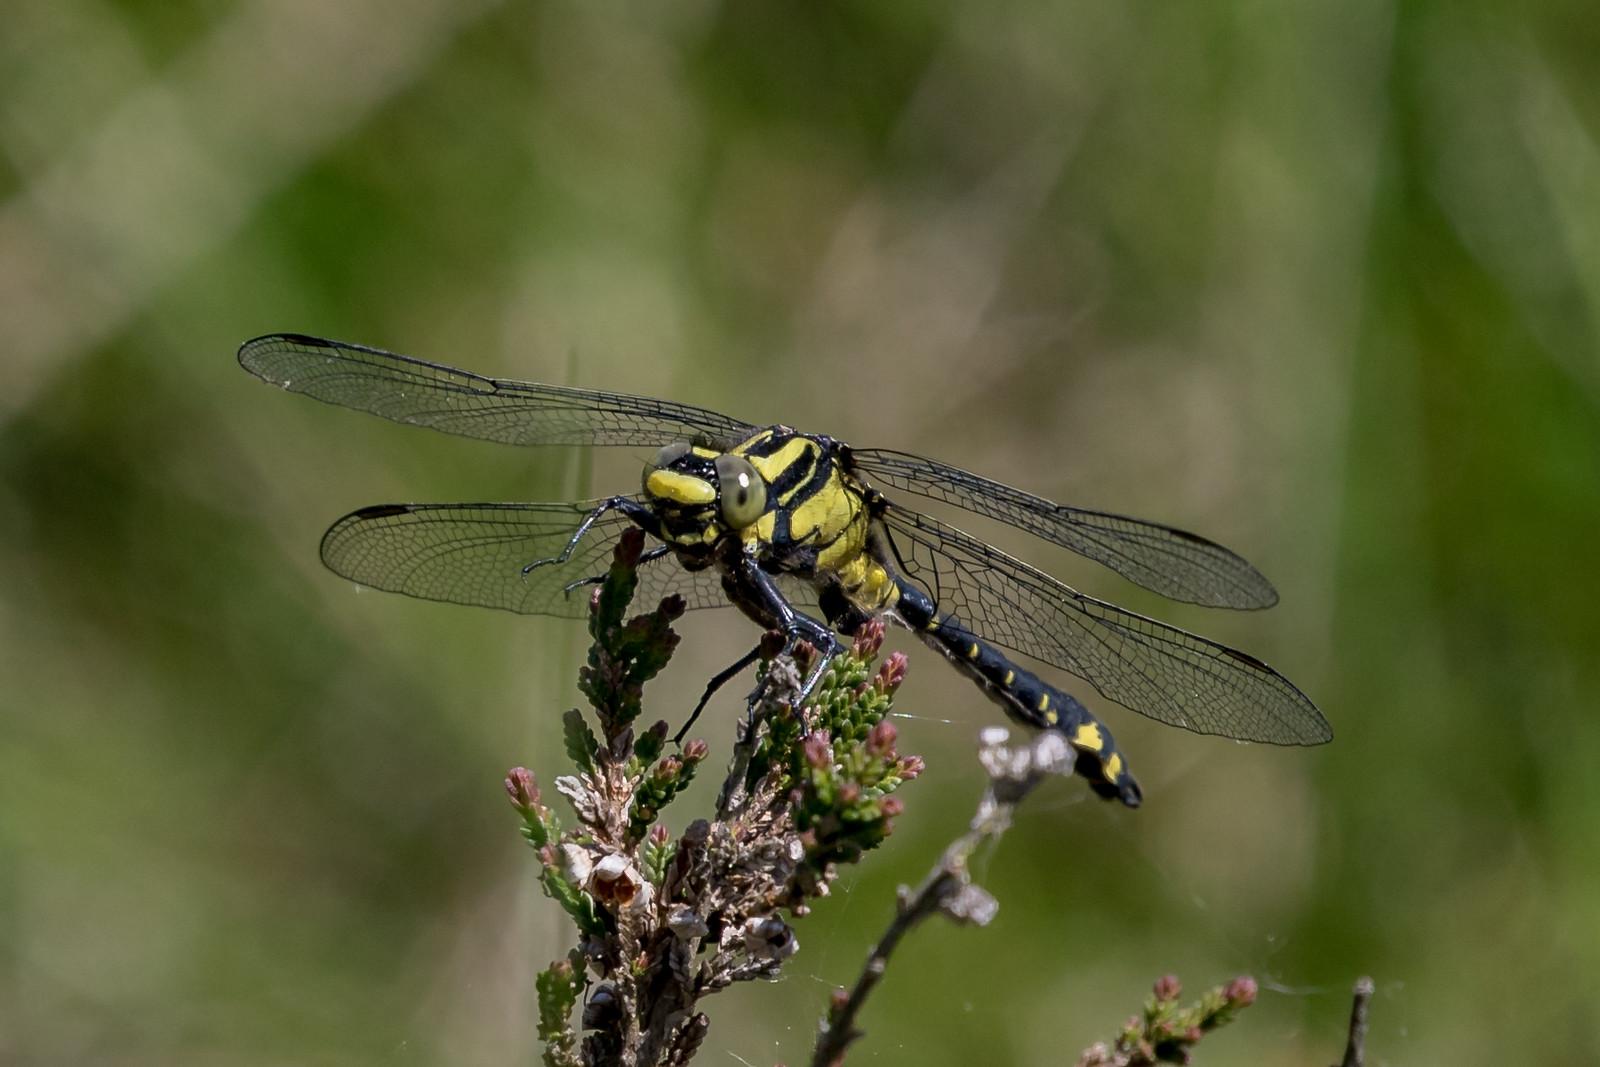 Almindelig flodguldsmed, Common Clubtail, Gomphus vulgatissimus, male.